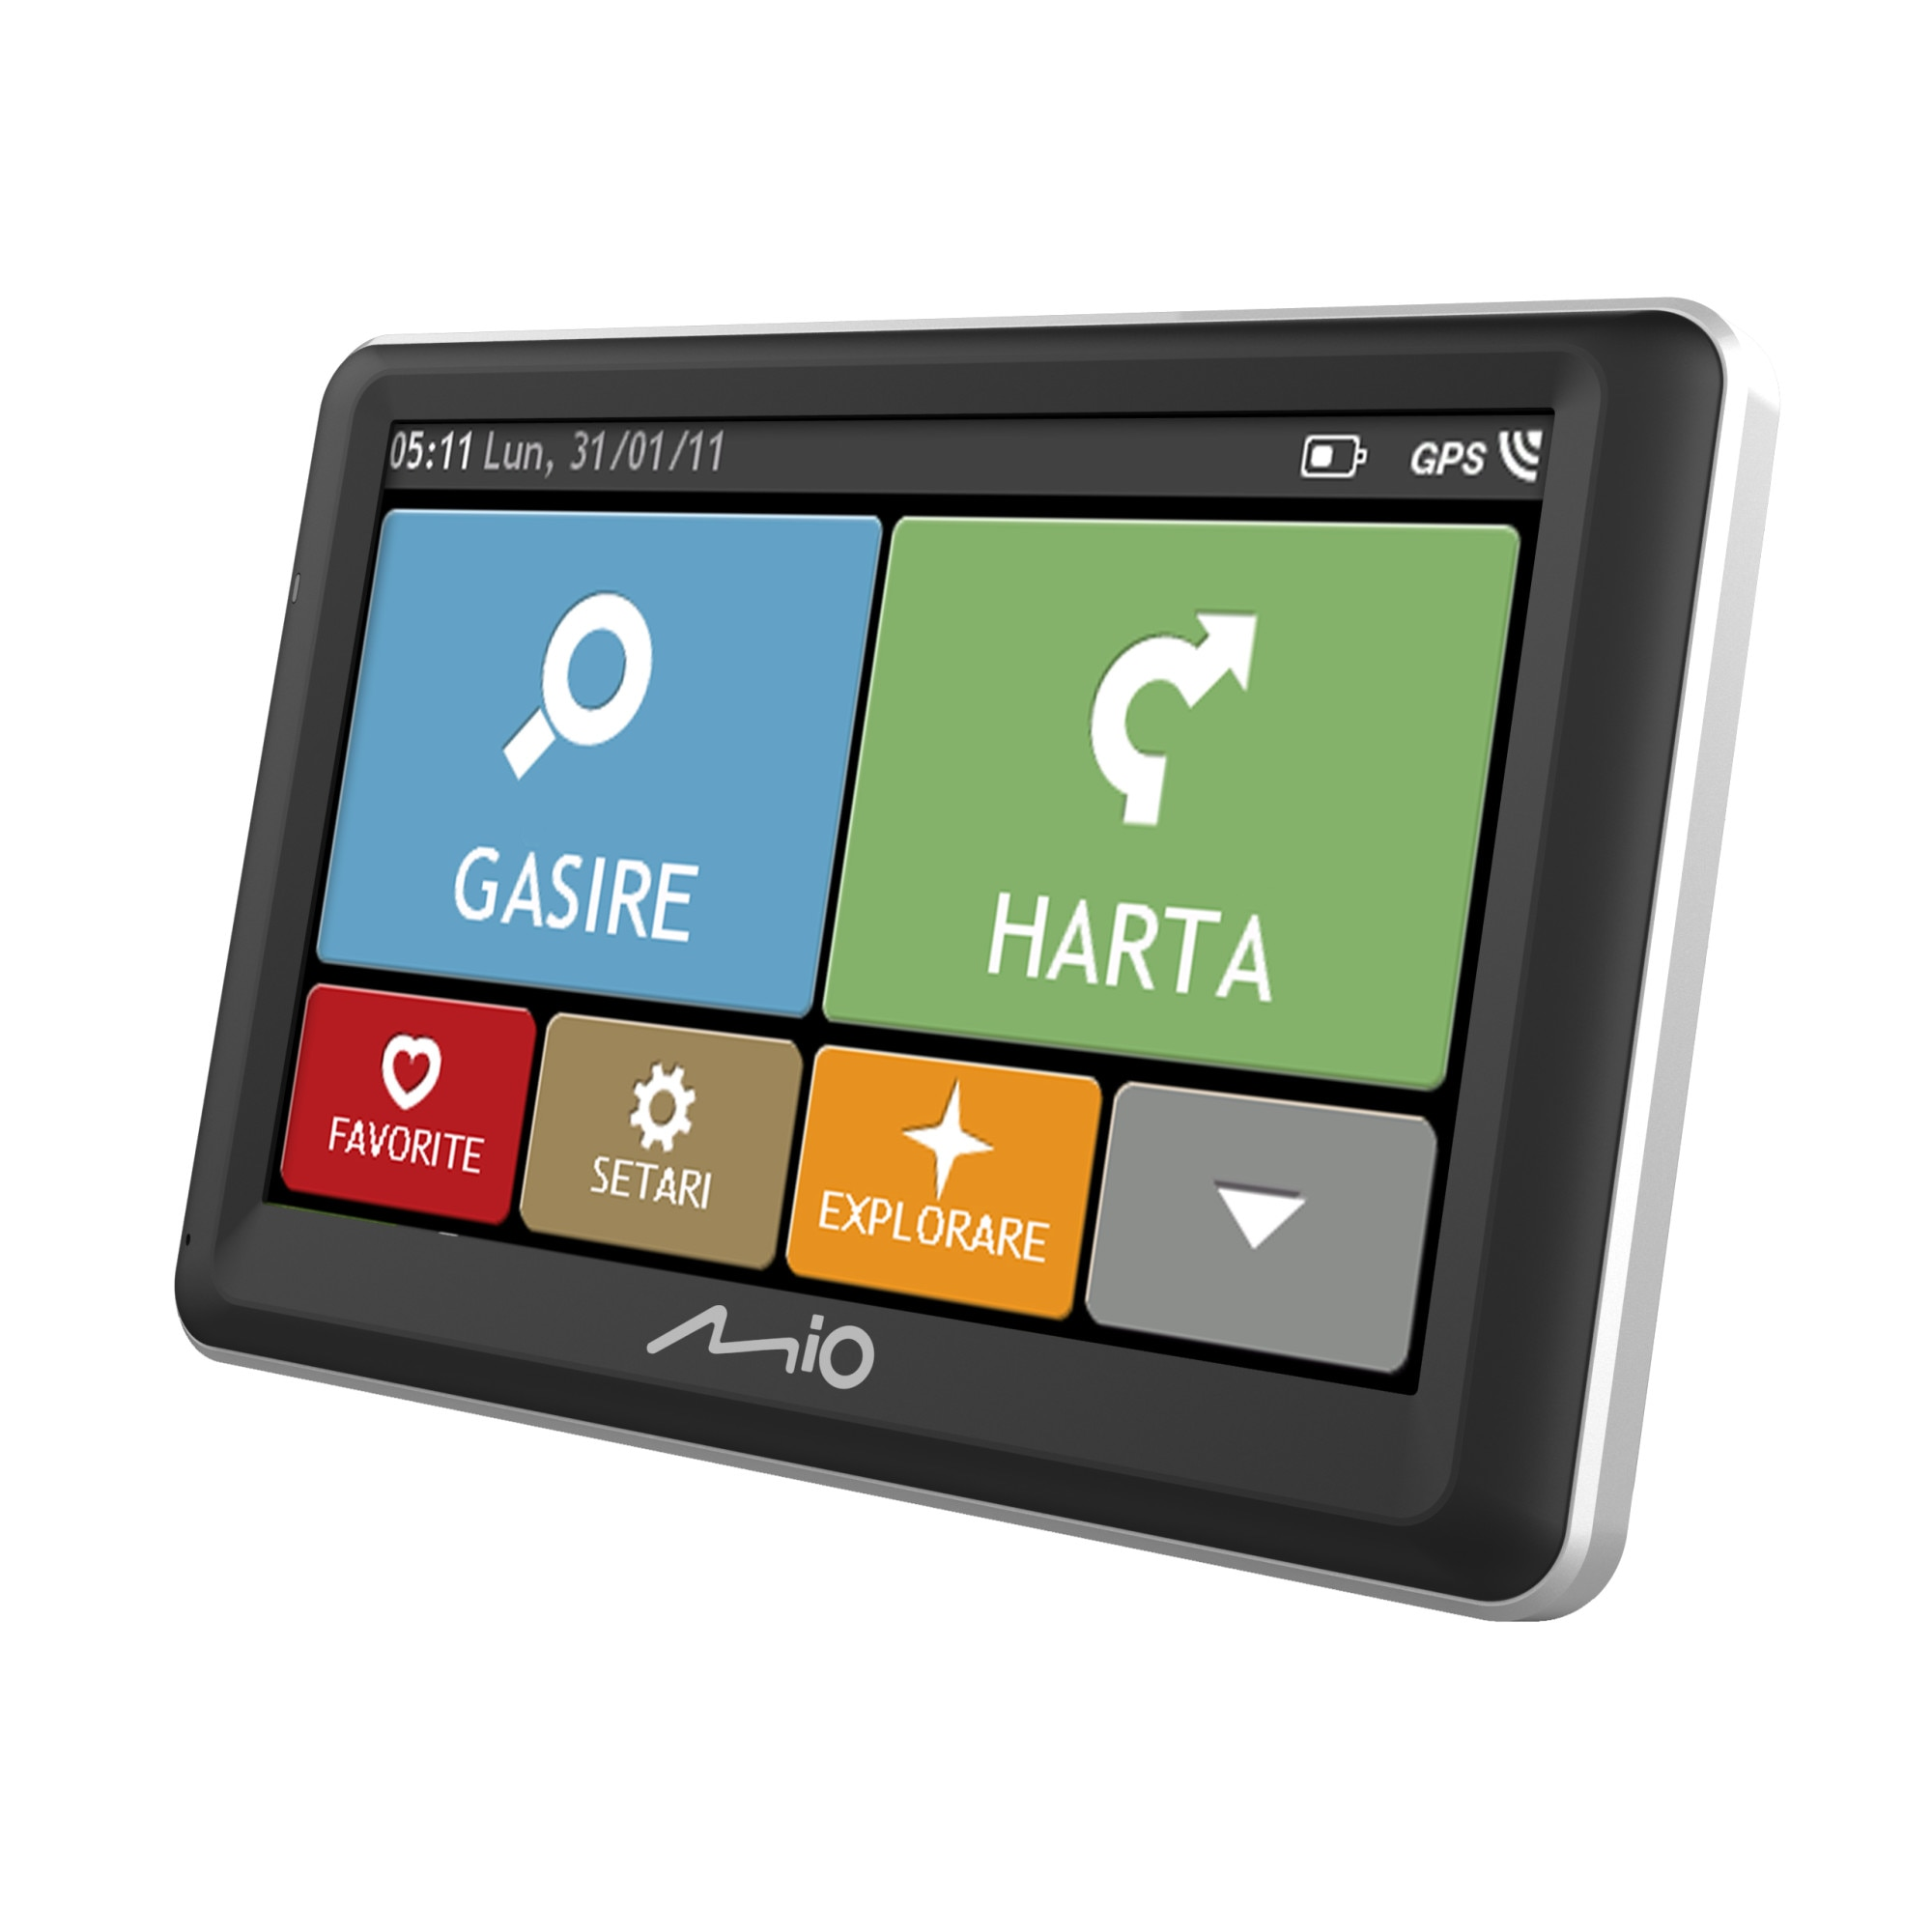 "Fotografie Sistem de navigatie Mio Spirit 7700 LM, ecran tactil de 5 "", actualizări gratuite pe viata, suport magnetic activ"